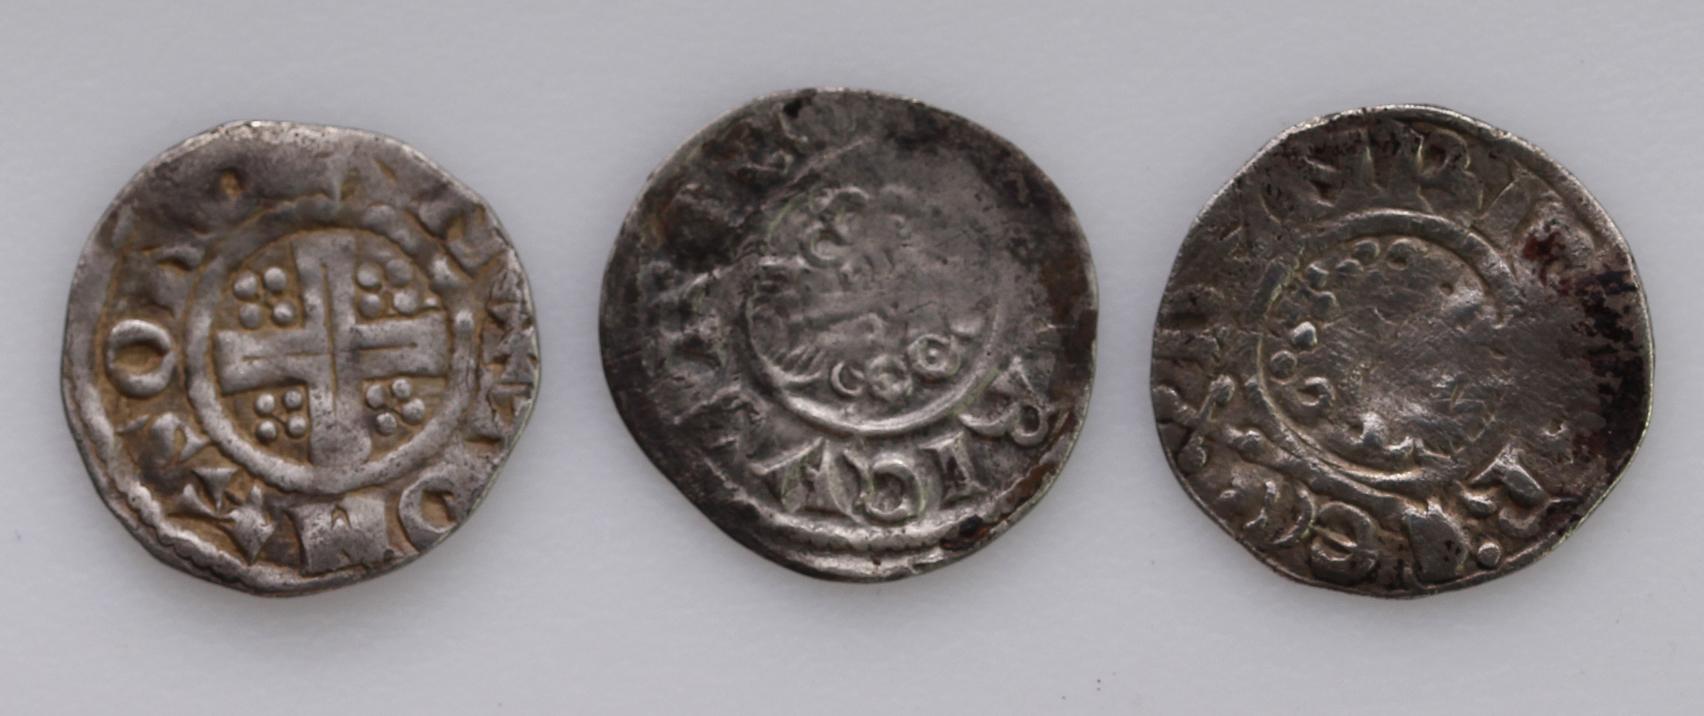 Henry III Short Cross Pennies of Canterbury (3): Class 7c1, moneyer Ioan Chic, S.1356C, 1.29g, VG;